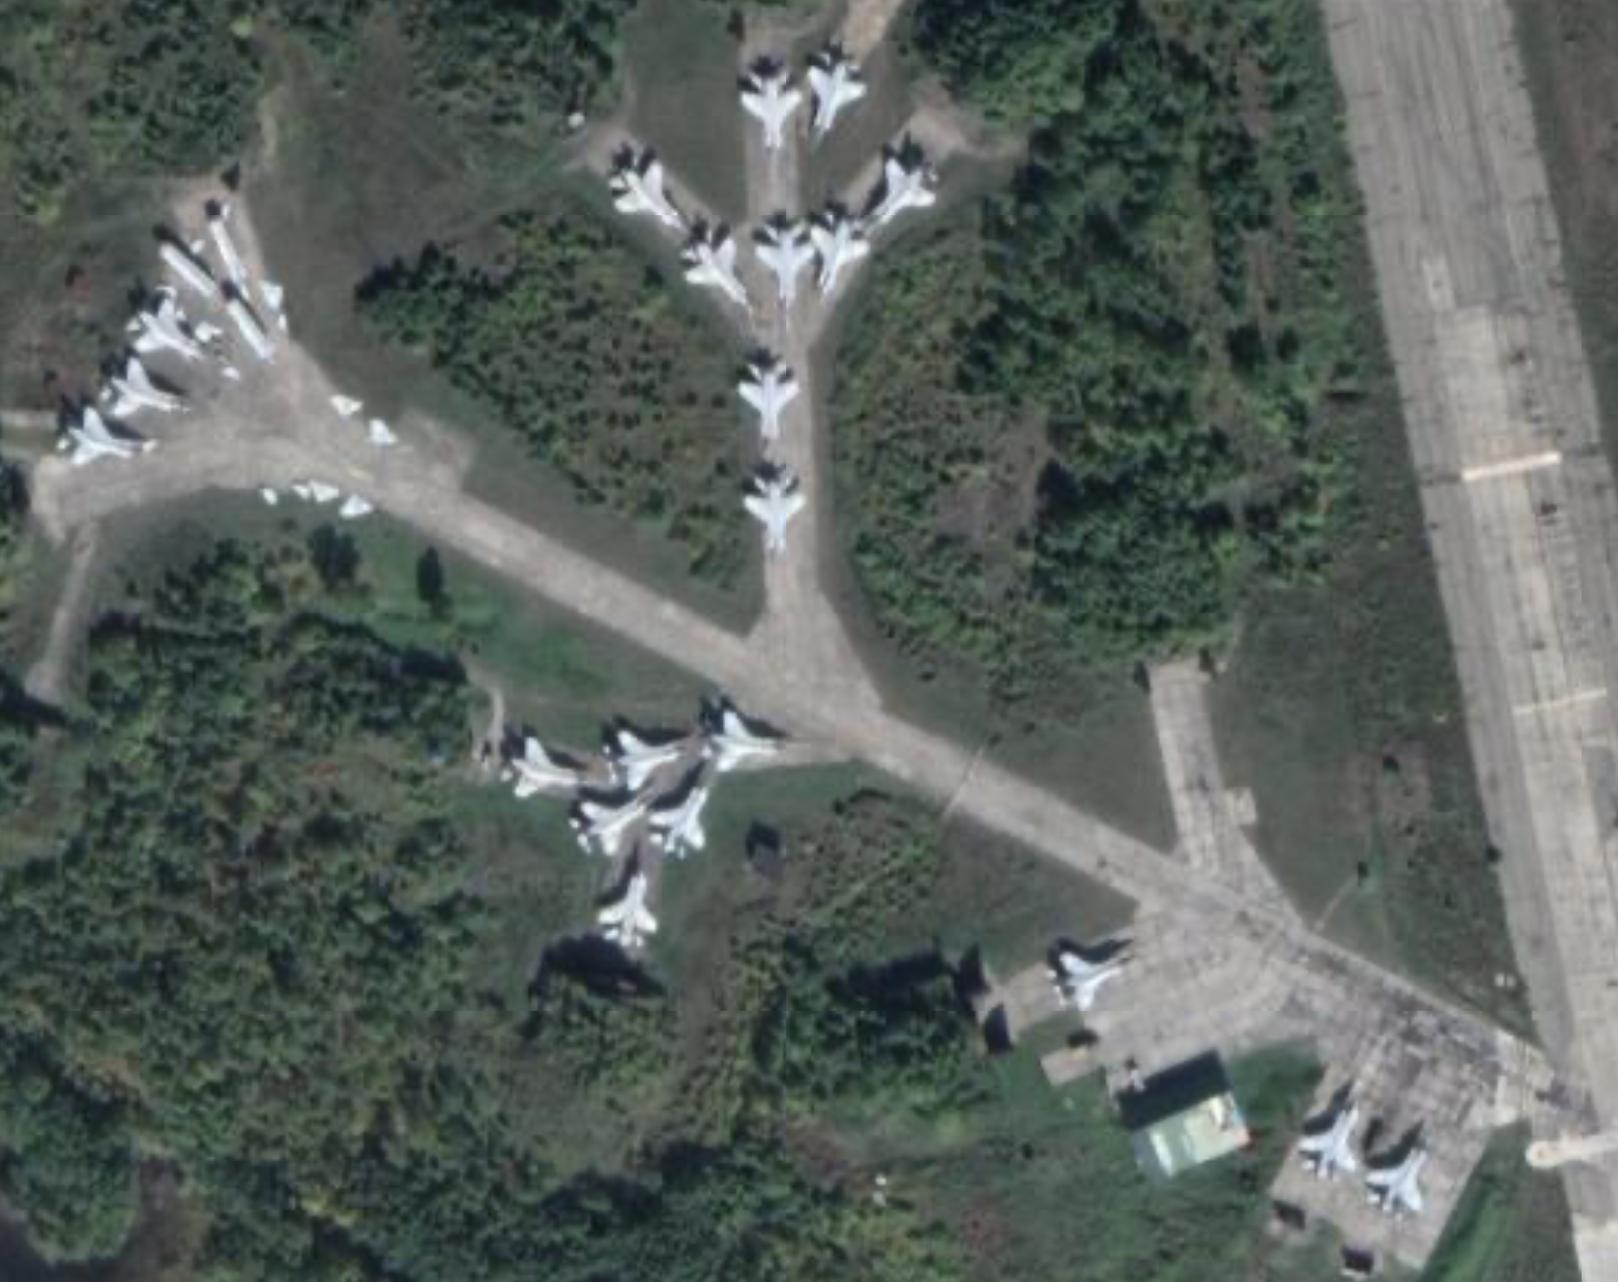 MiG 31s in front of hangars (Google Maps)